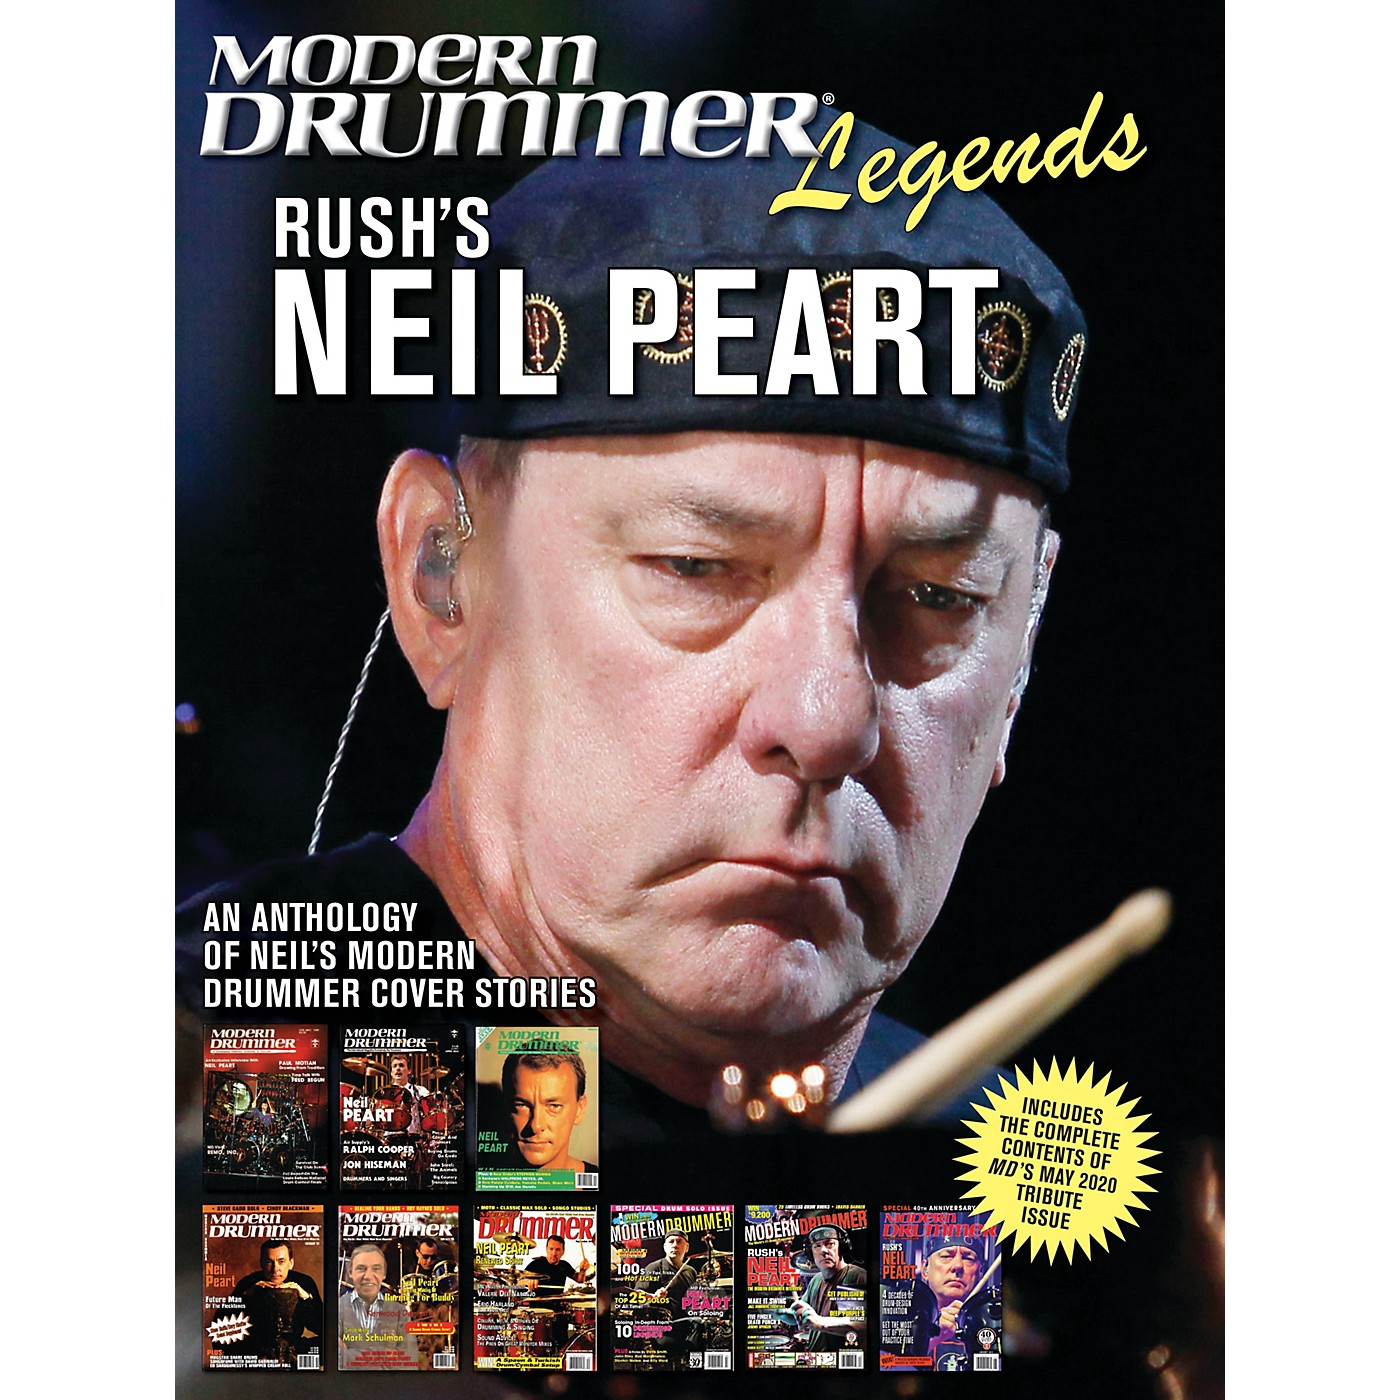 Modern Drummer Modern Drummer Legends: Rush's Neil Peart - An Anthology of Neil's Modern Drummer Cover Stories thumbnail